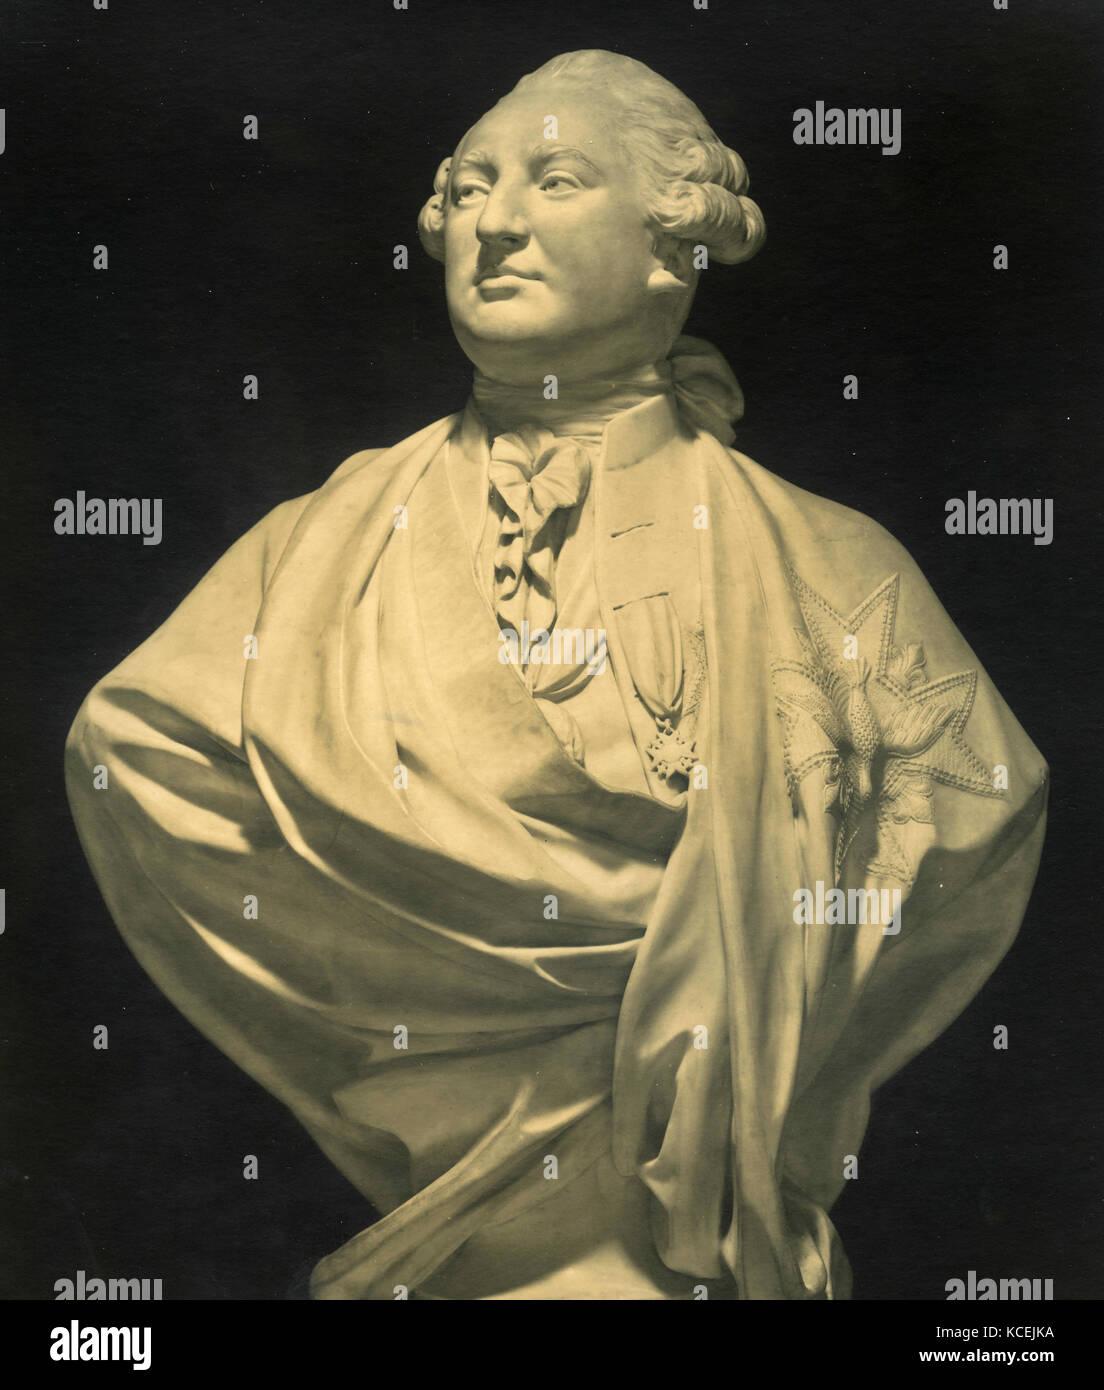 Louis XVI, marble bust statue by JA Houdon, 1920 - Stock Image